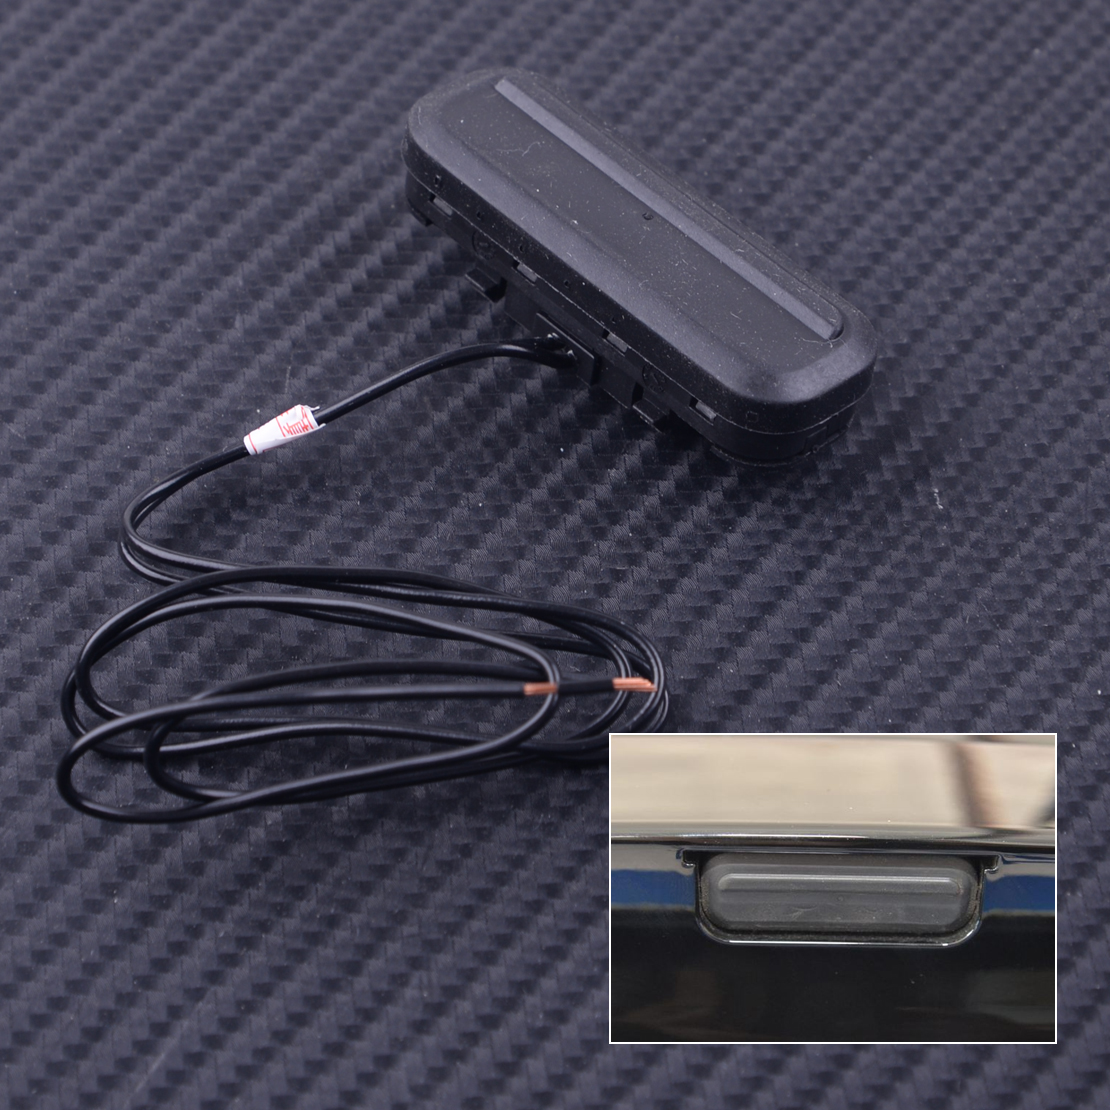 chevy cruze wiring harnes boot [ 1110 x 1110 Pixel ]